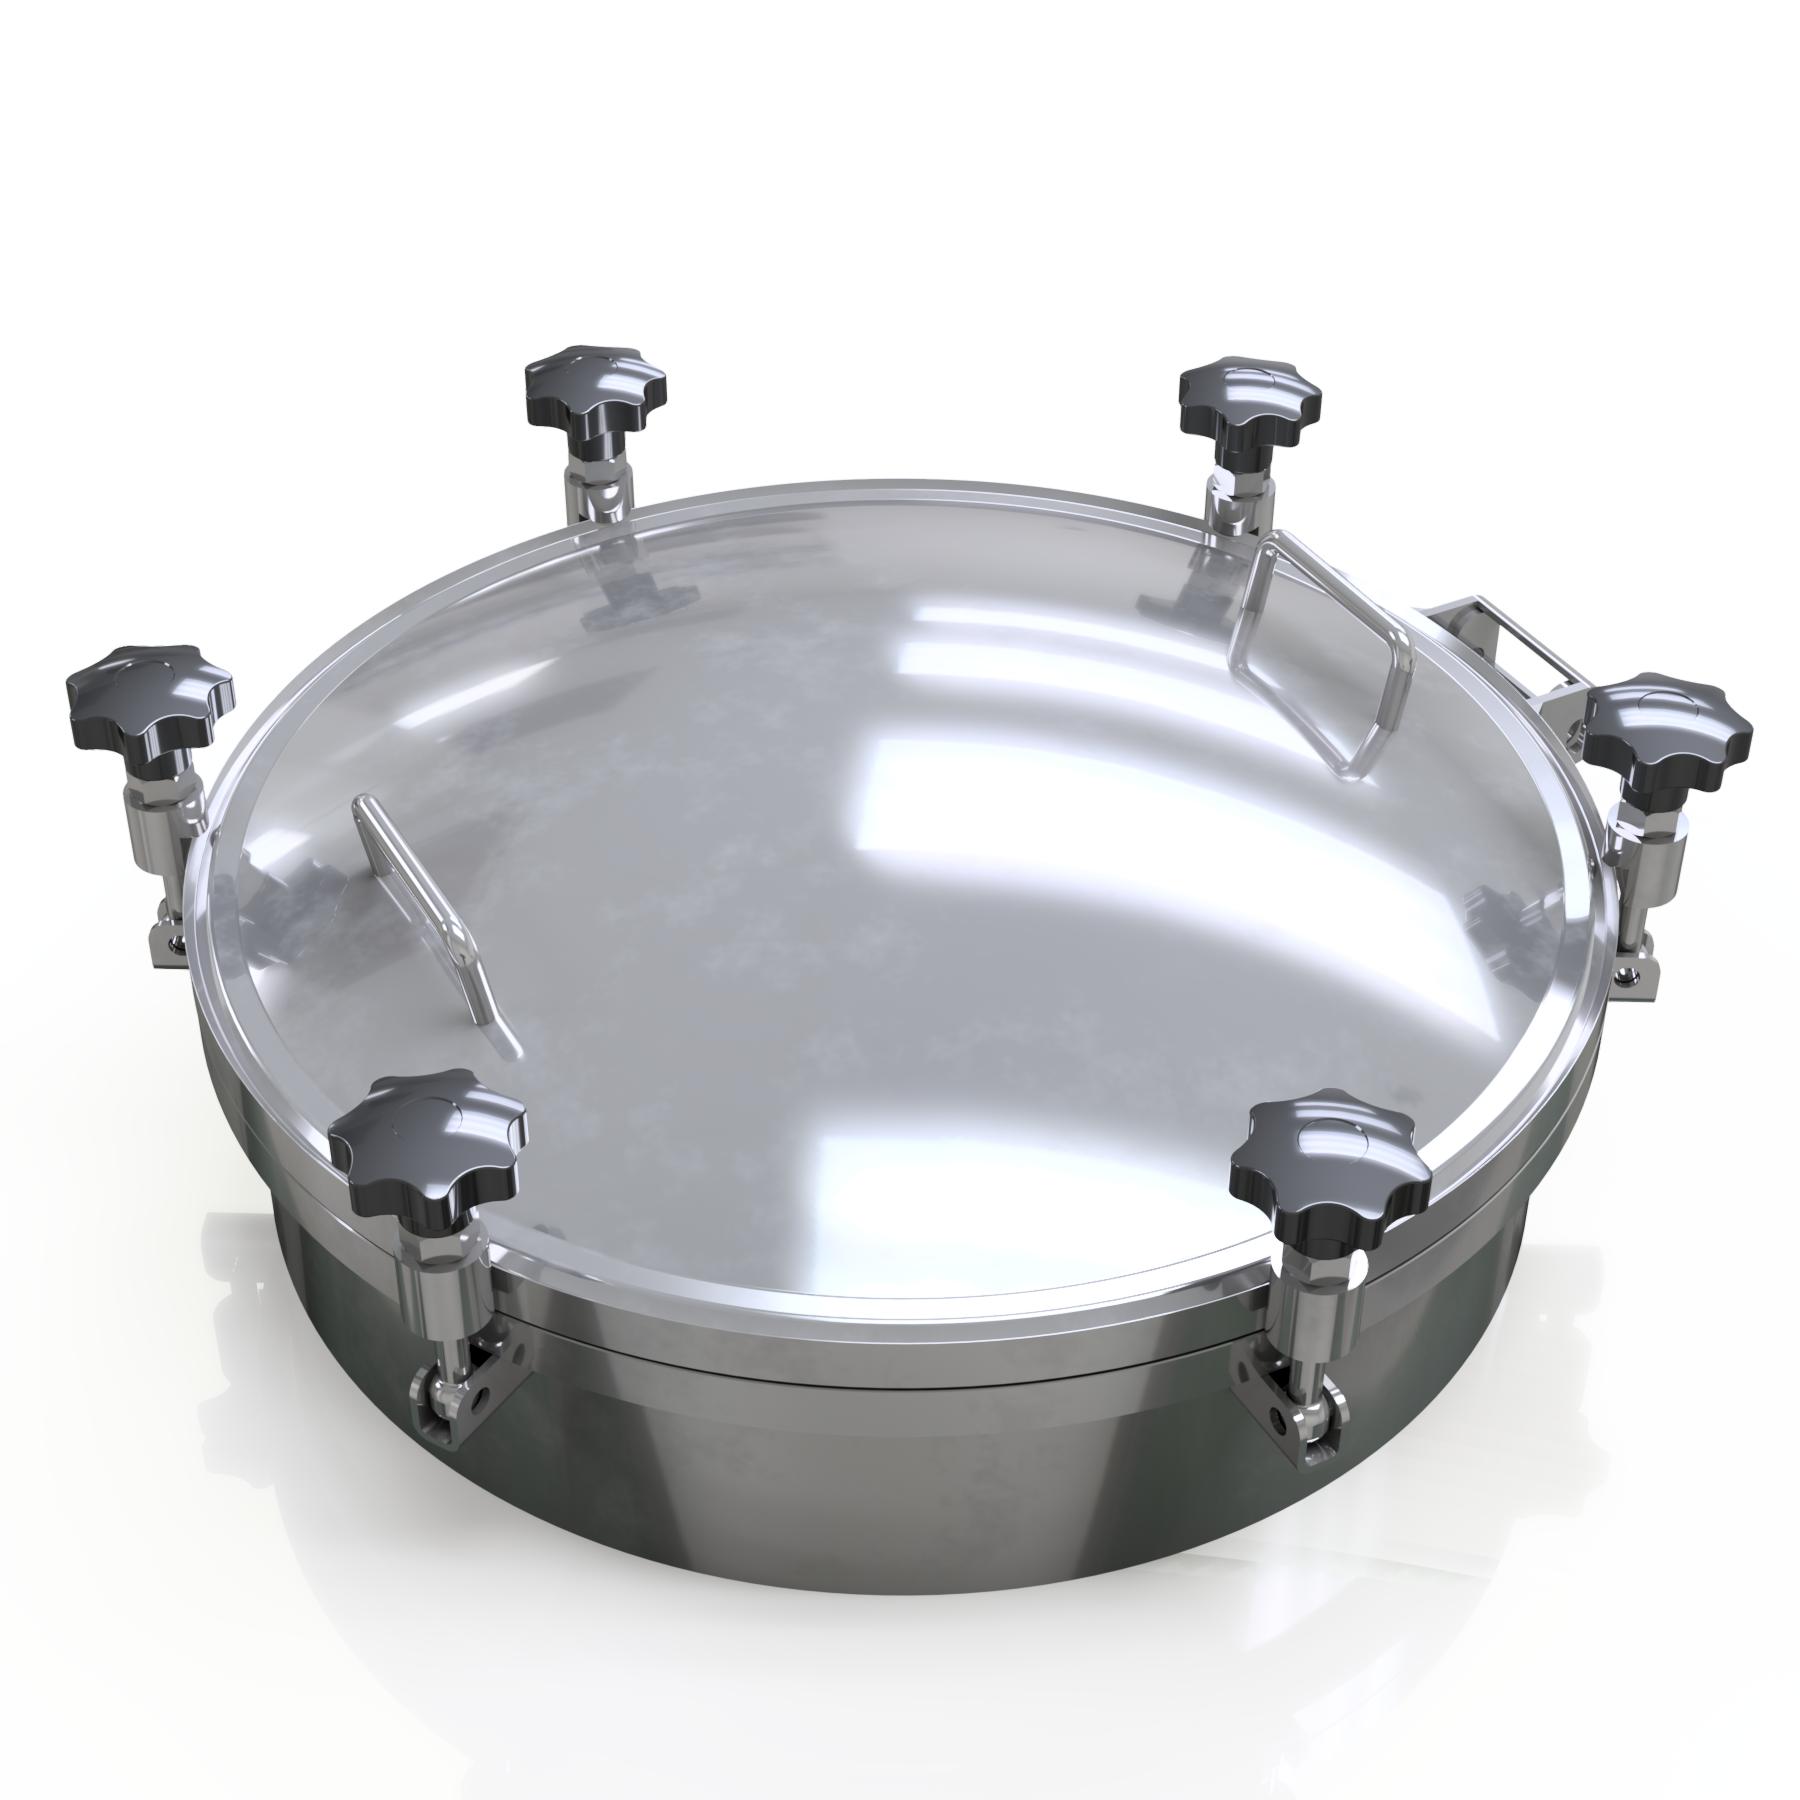 Compuerta Circular 350mm / Presión